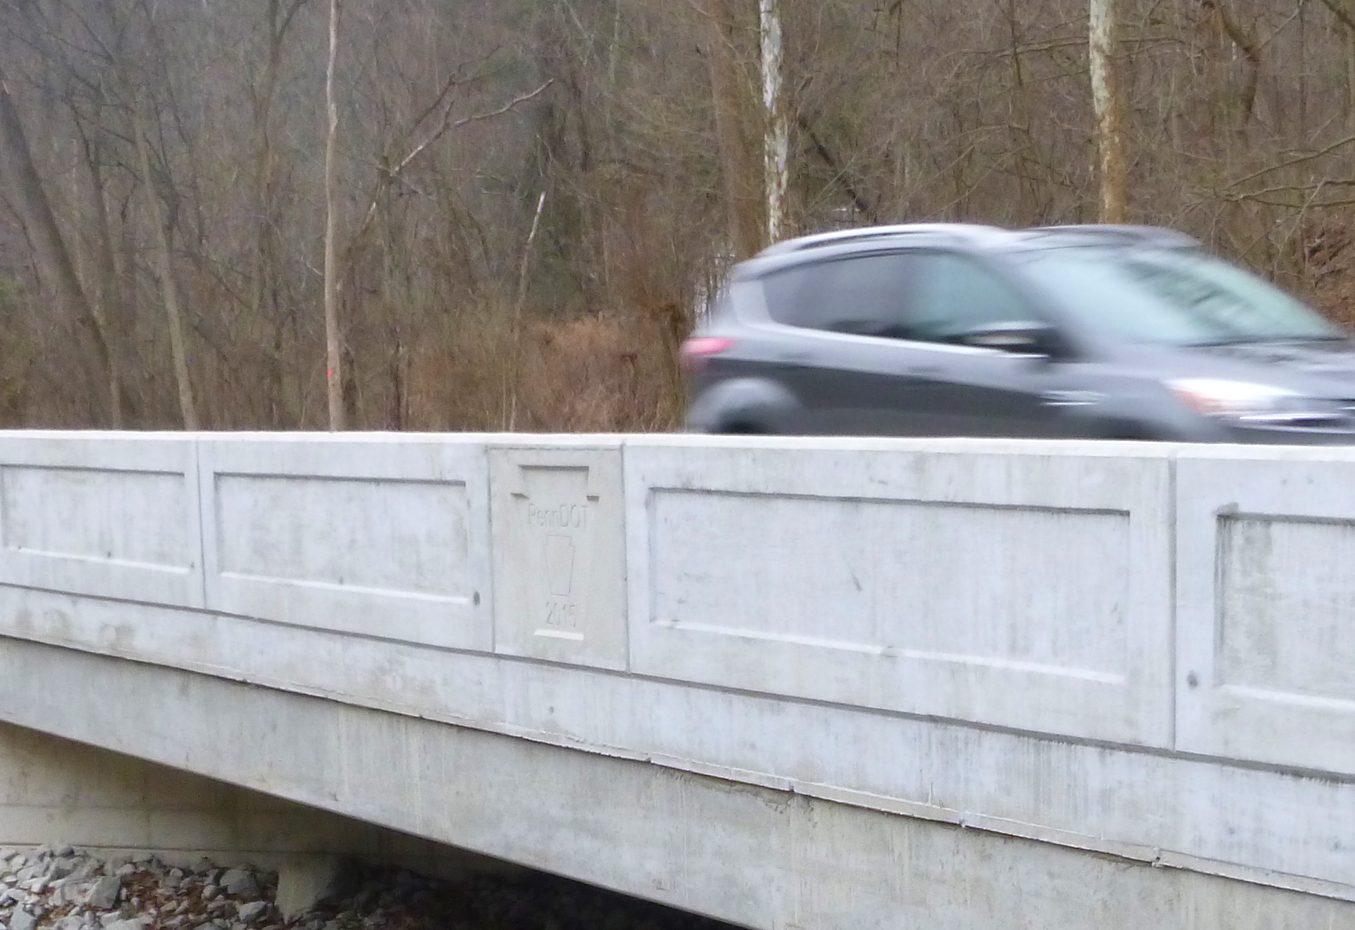 P3 Rapid Bridge Replacement Project